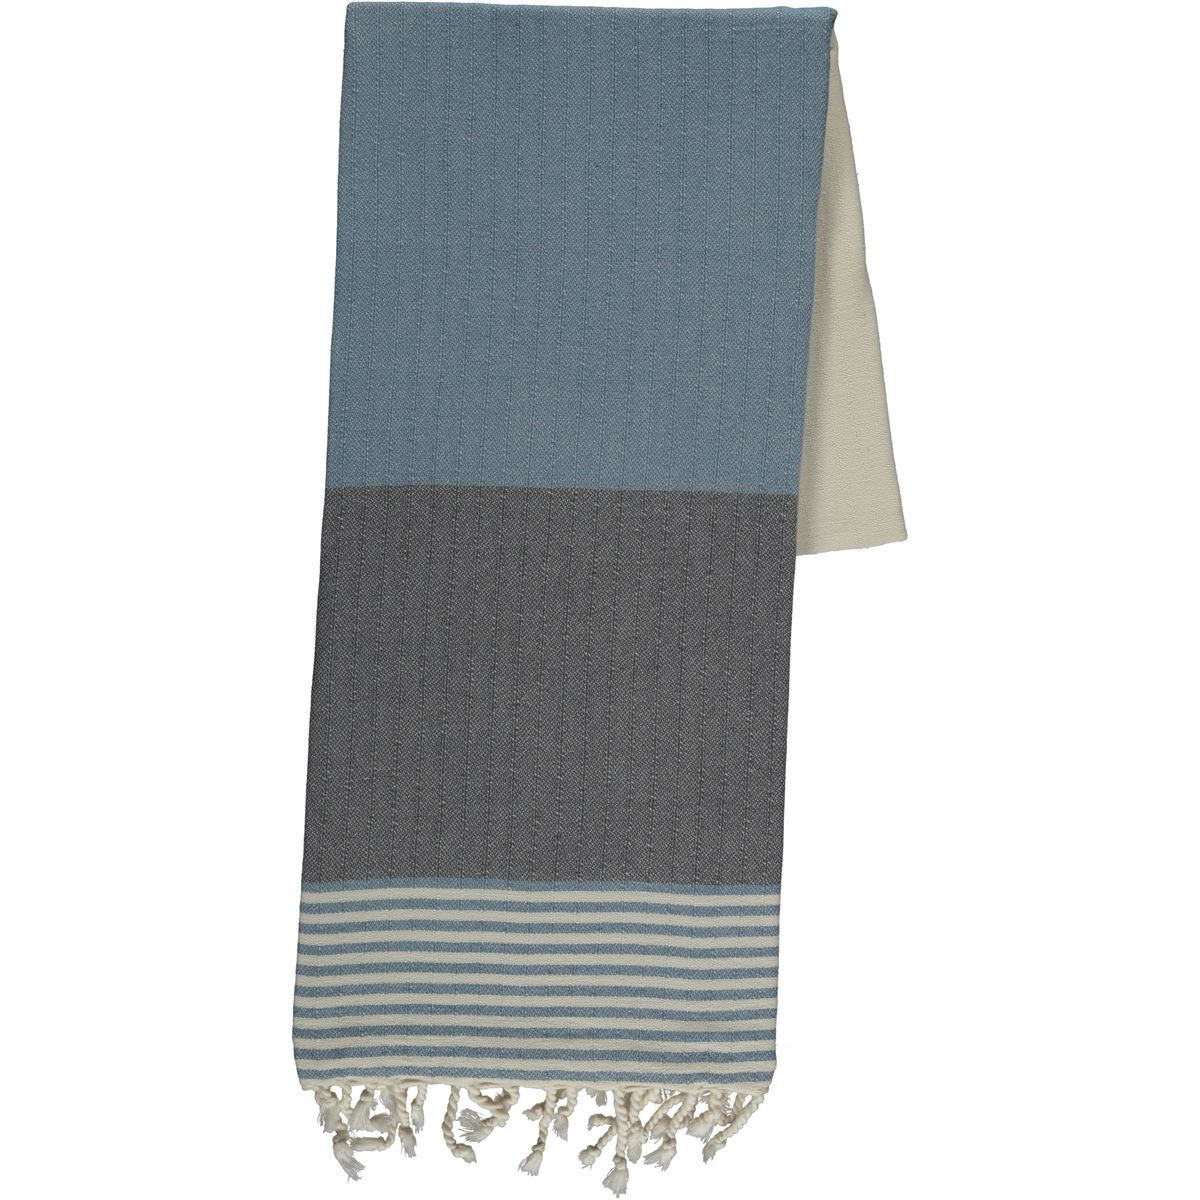 Peshtemal Twin Sultan - Dark Grey / Air Blue